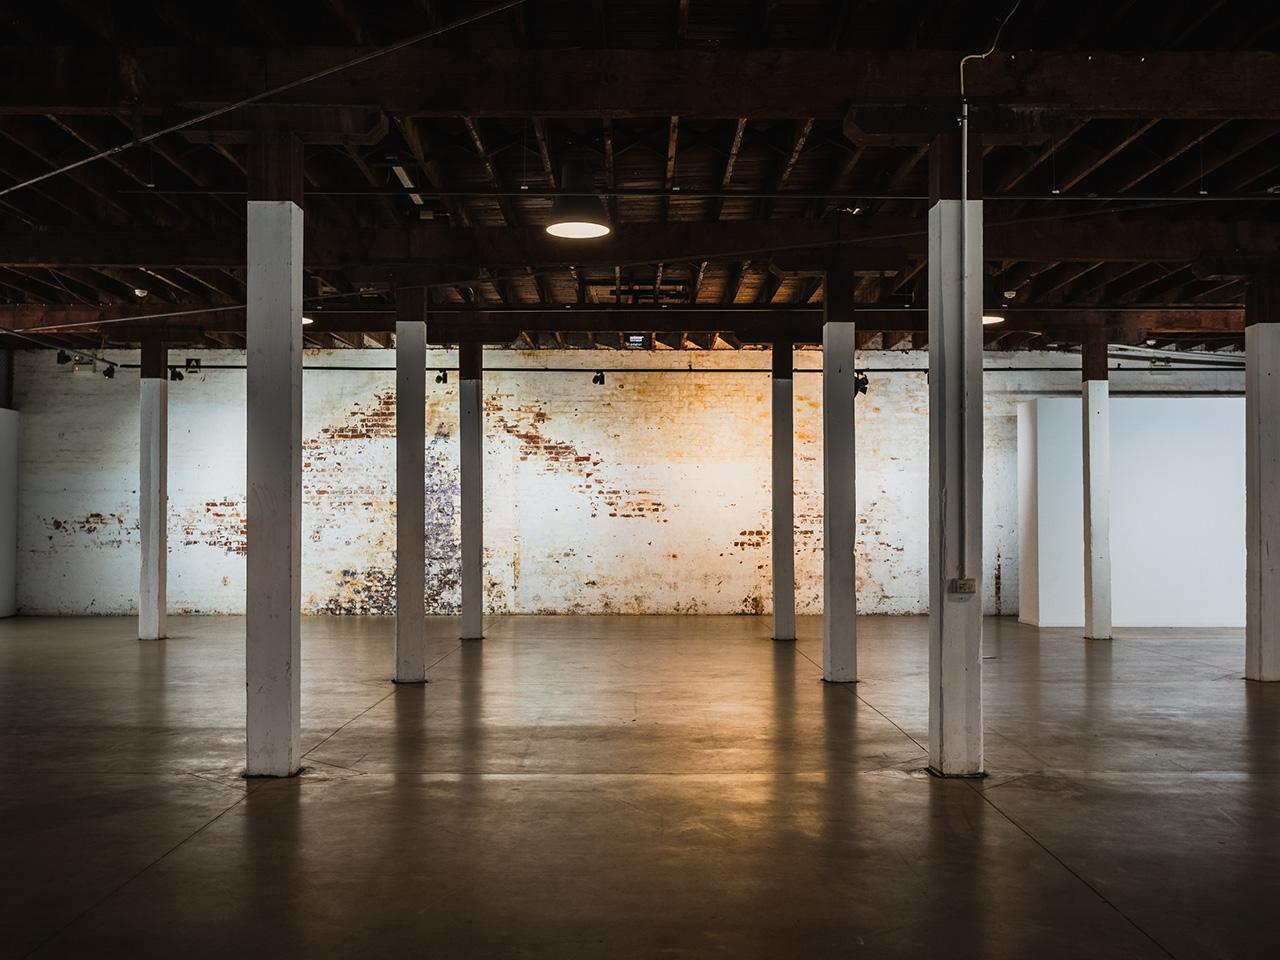 Blank Canvas Perth Venue With Dim Lighting